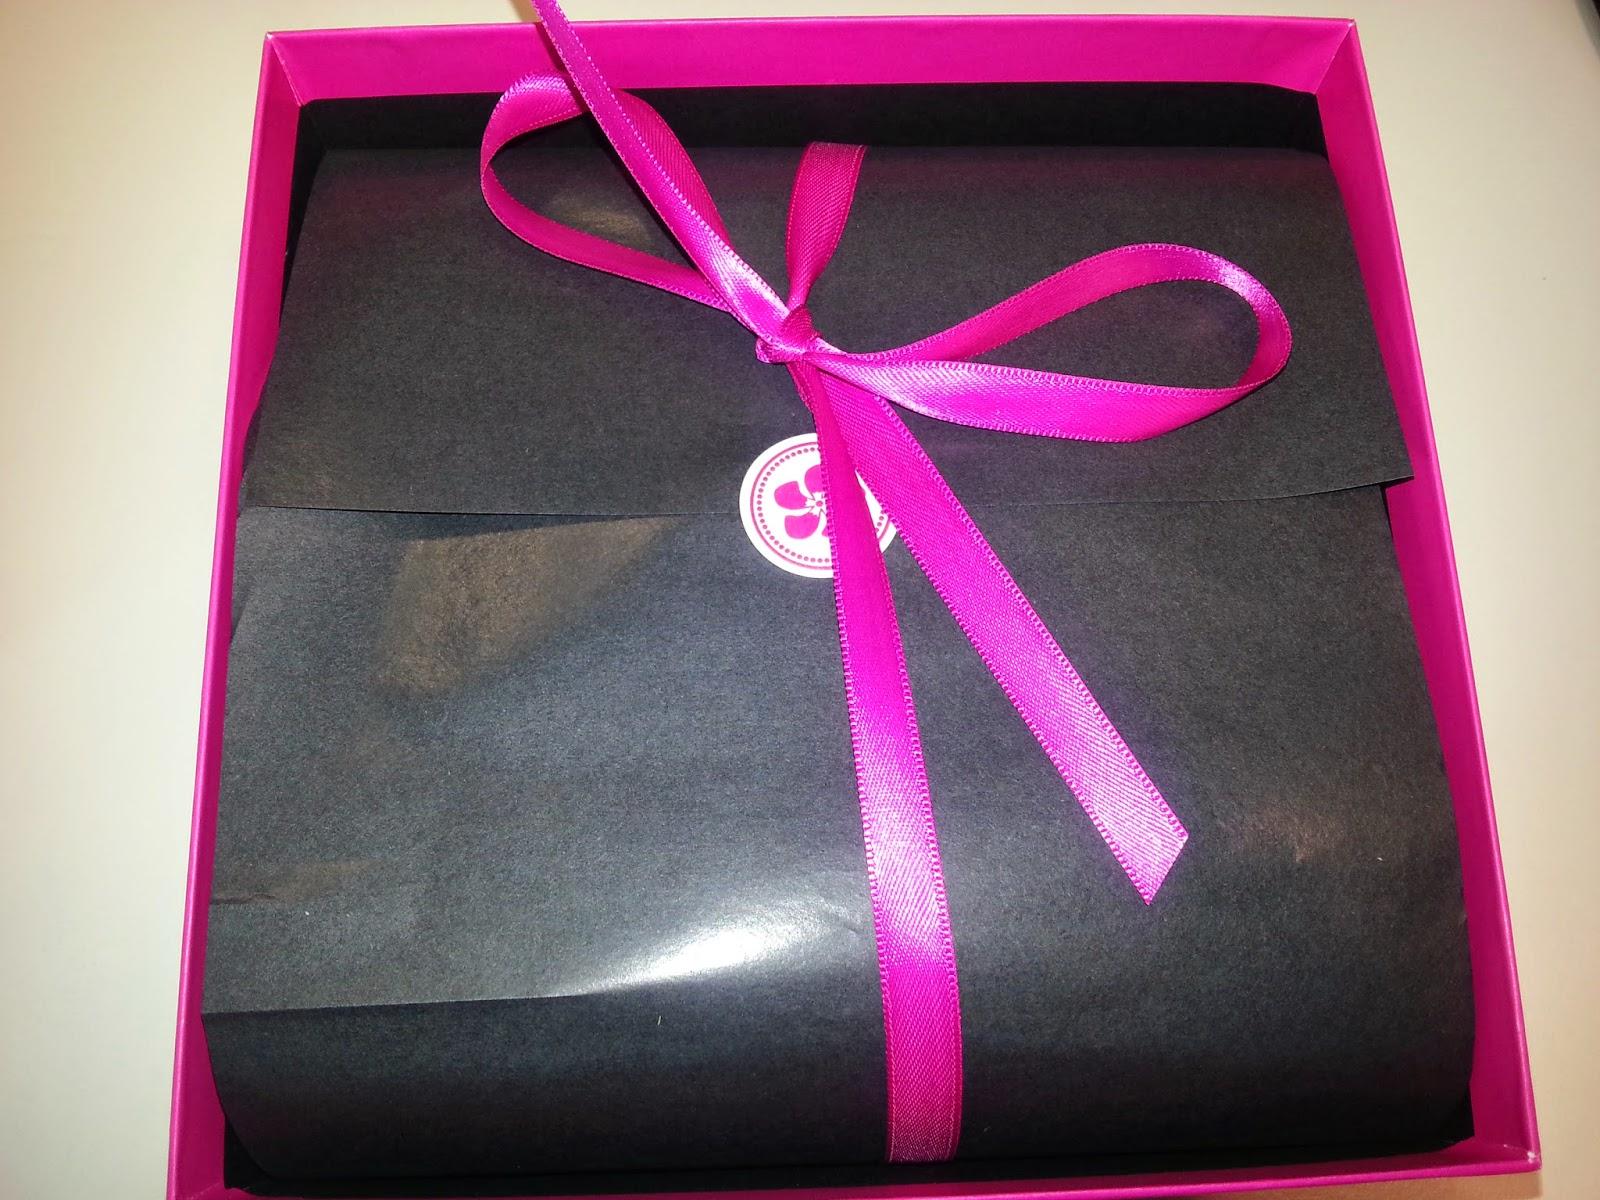 Oktober - Glossy Box vs. Pink Box - www.annitschkasblog.de